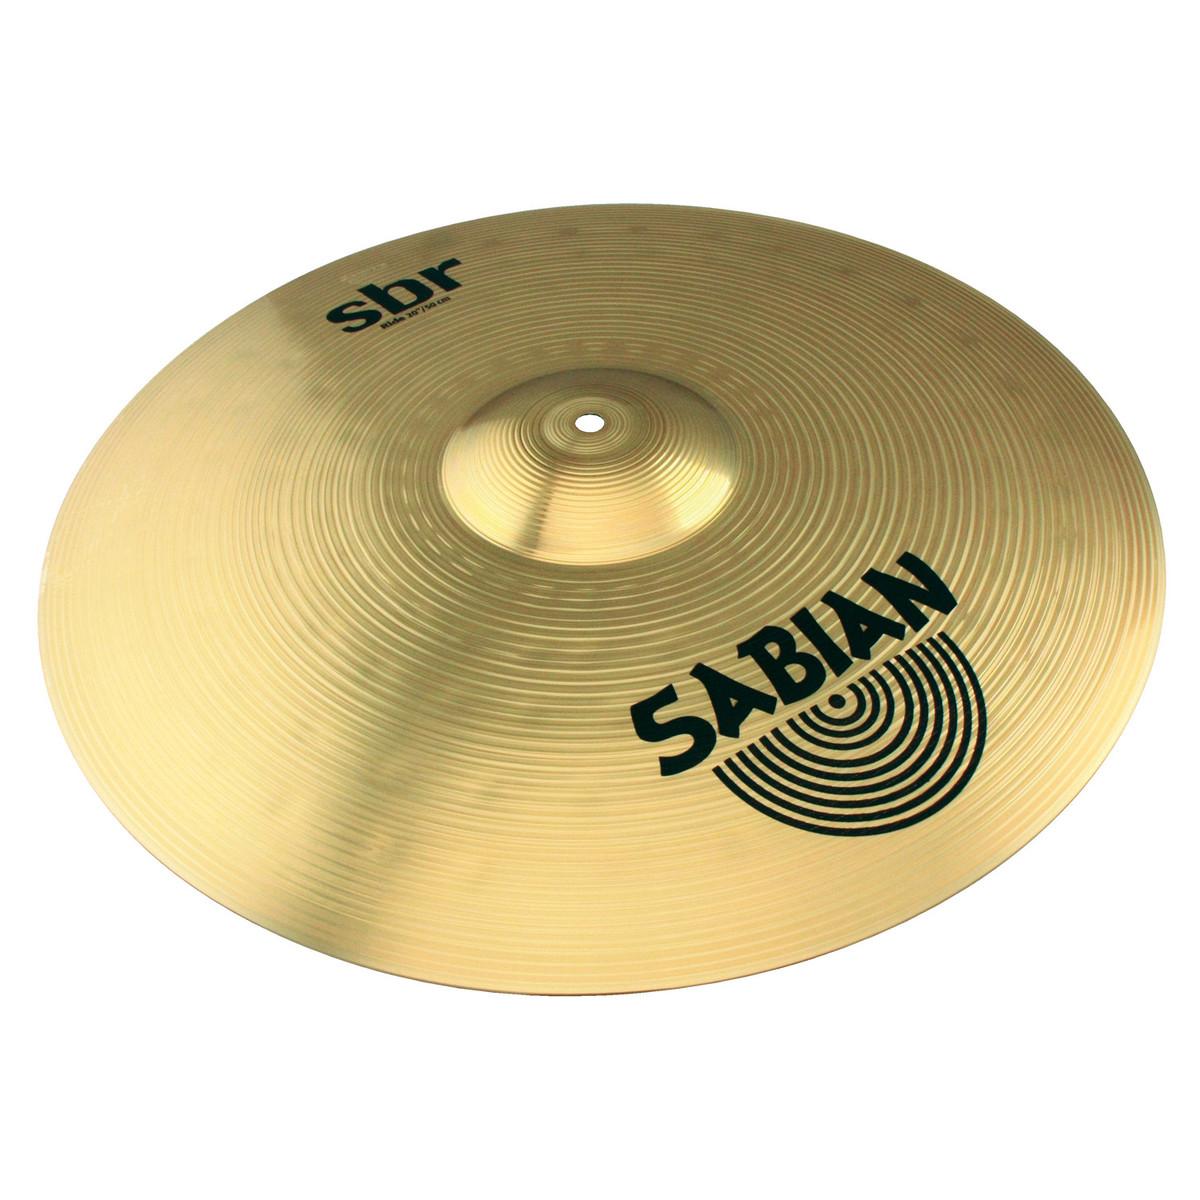 sabian sbr cymbal performance set 14 39 39 hi hat 16 39 39 crash 20 39 39 ride b stock at gear4music. Black Bedroom Furniture Sets. Home Design Ideas